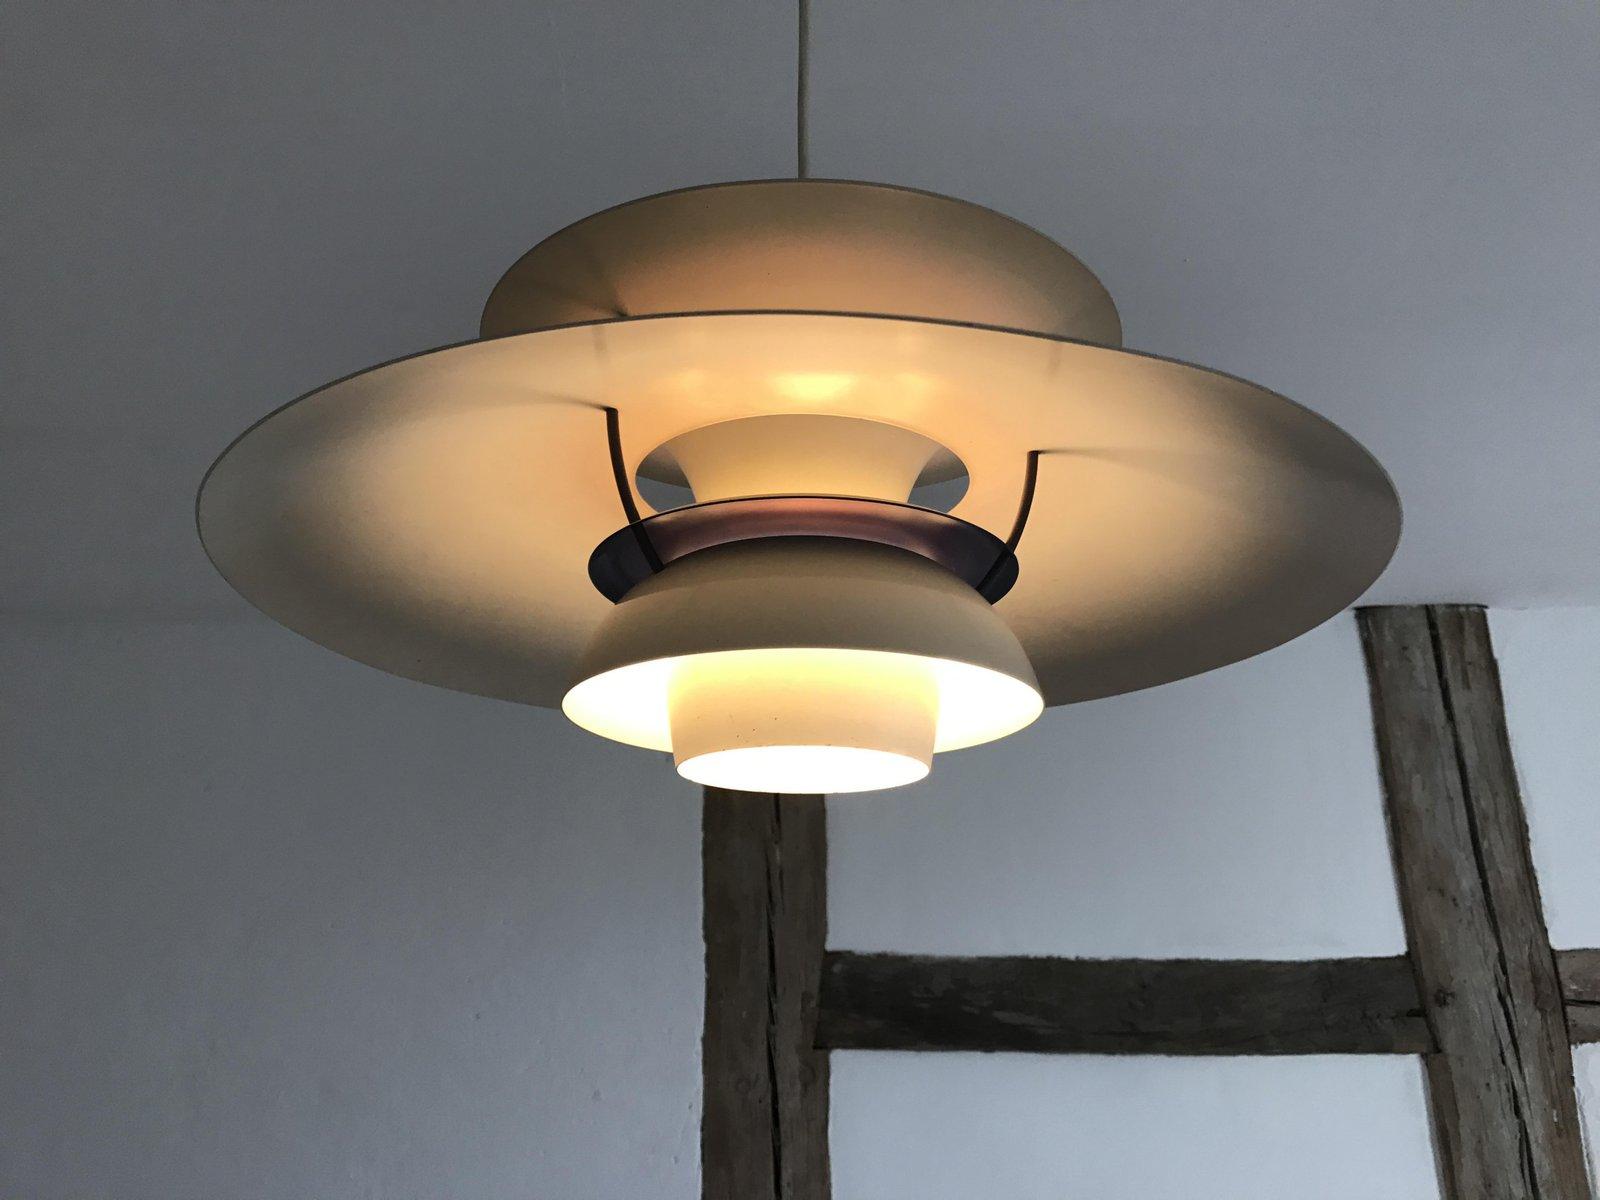 vintage ph5 pendant lamp by poul hennigsen for louis. Black Bedroom Furniture Sets. Home Design Ideas